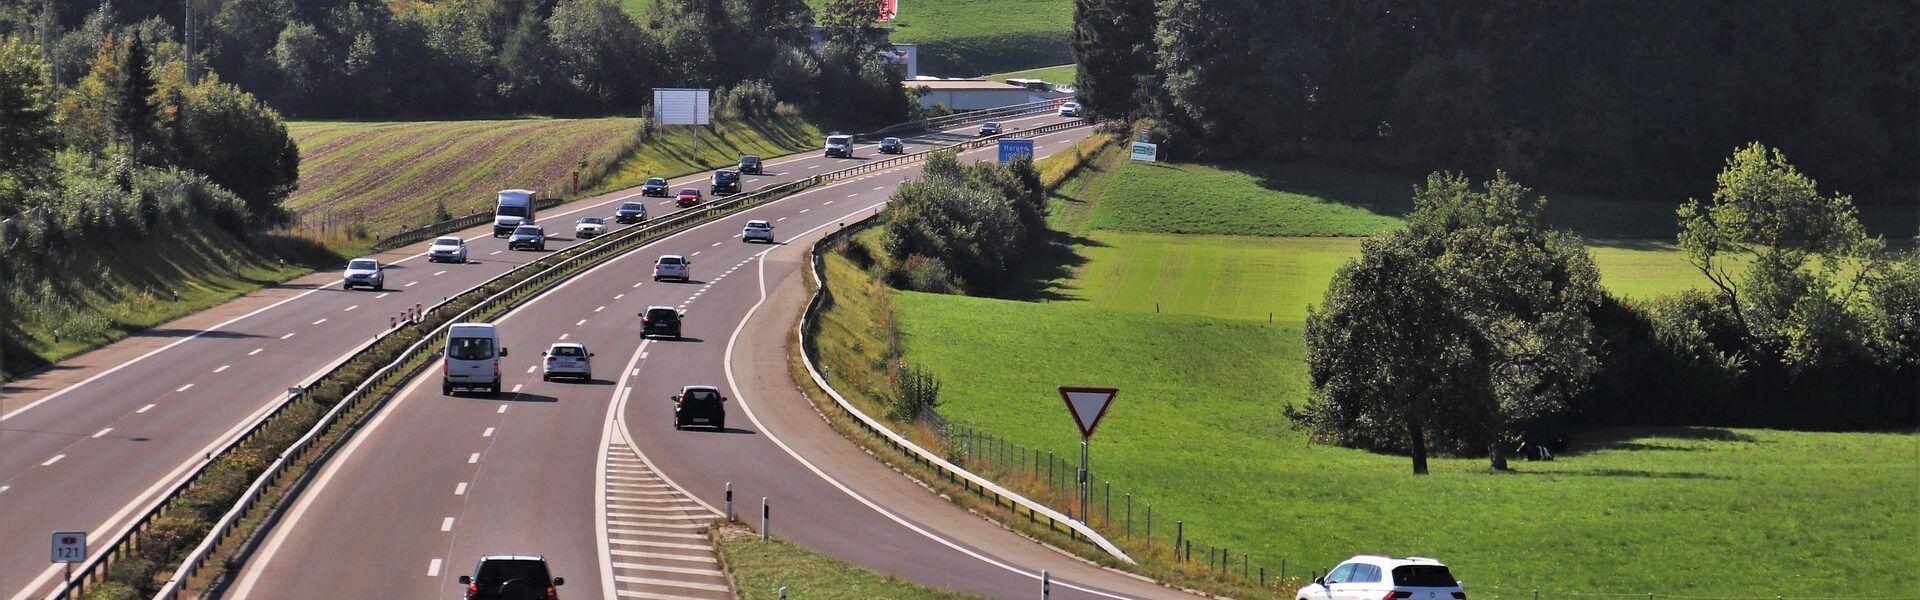 autopistas-peajes-gratuitos-2021